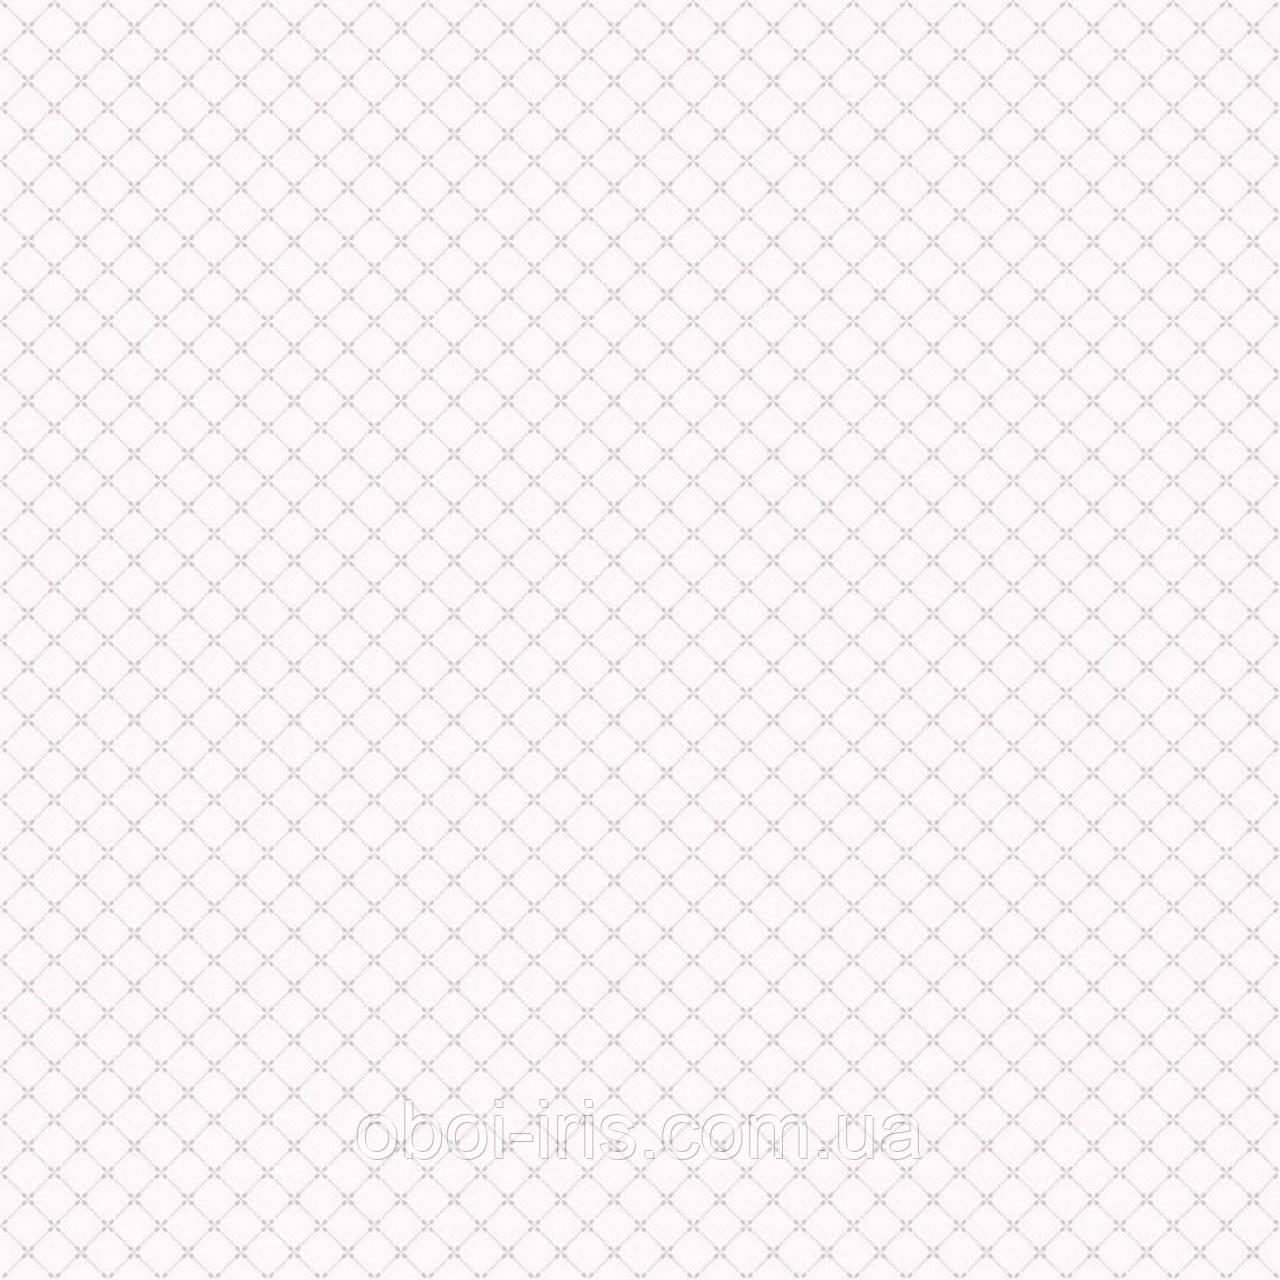 WU20611 обои Whats Up II моющиеся детские обои Бельгия Decoprint